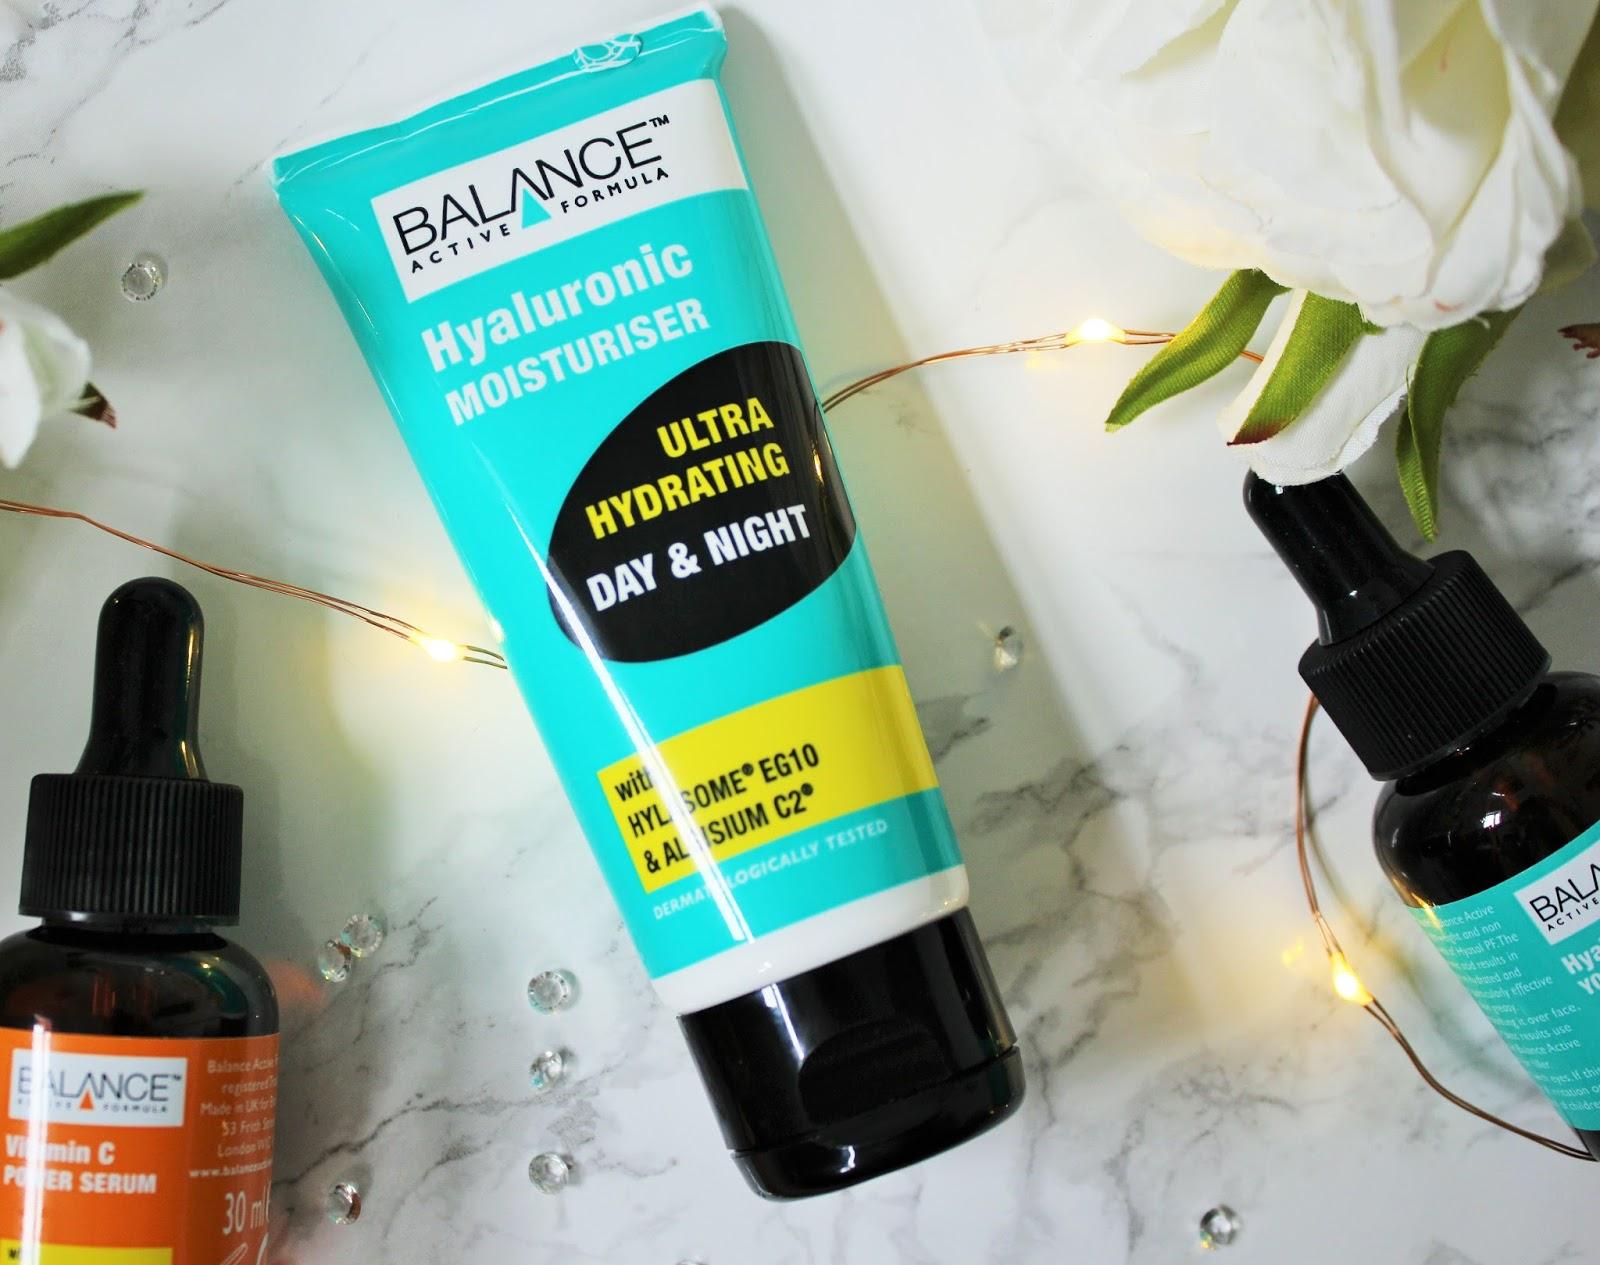 Balance Active Formula Skincare Review - 5 - Hyaluronic Moisturiser